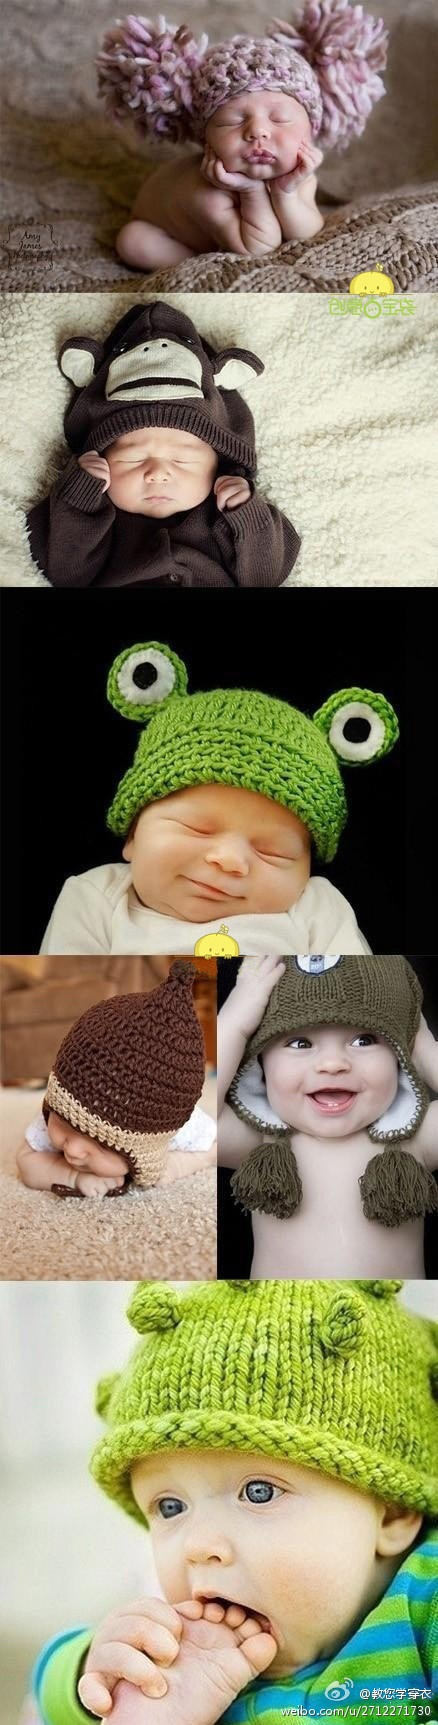 baby hats ^^